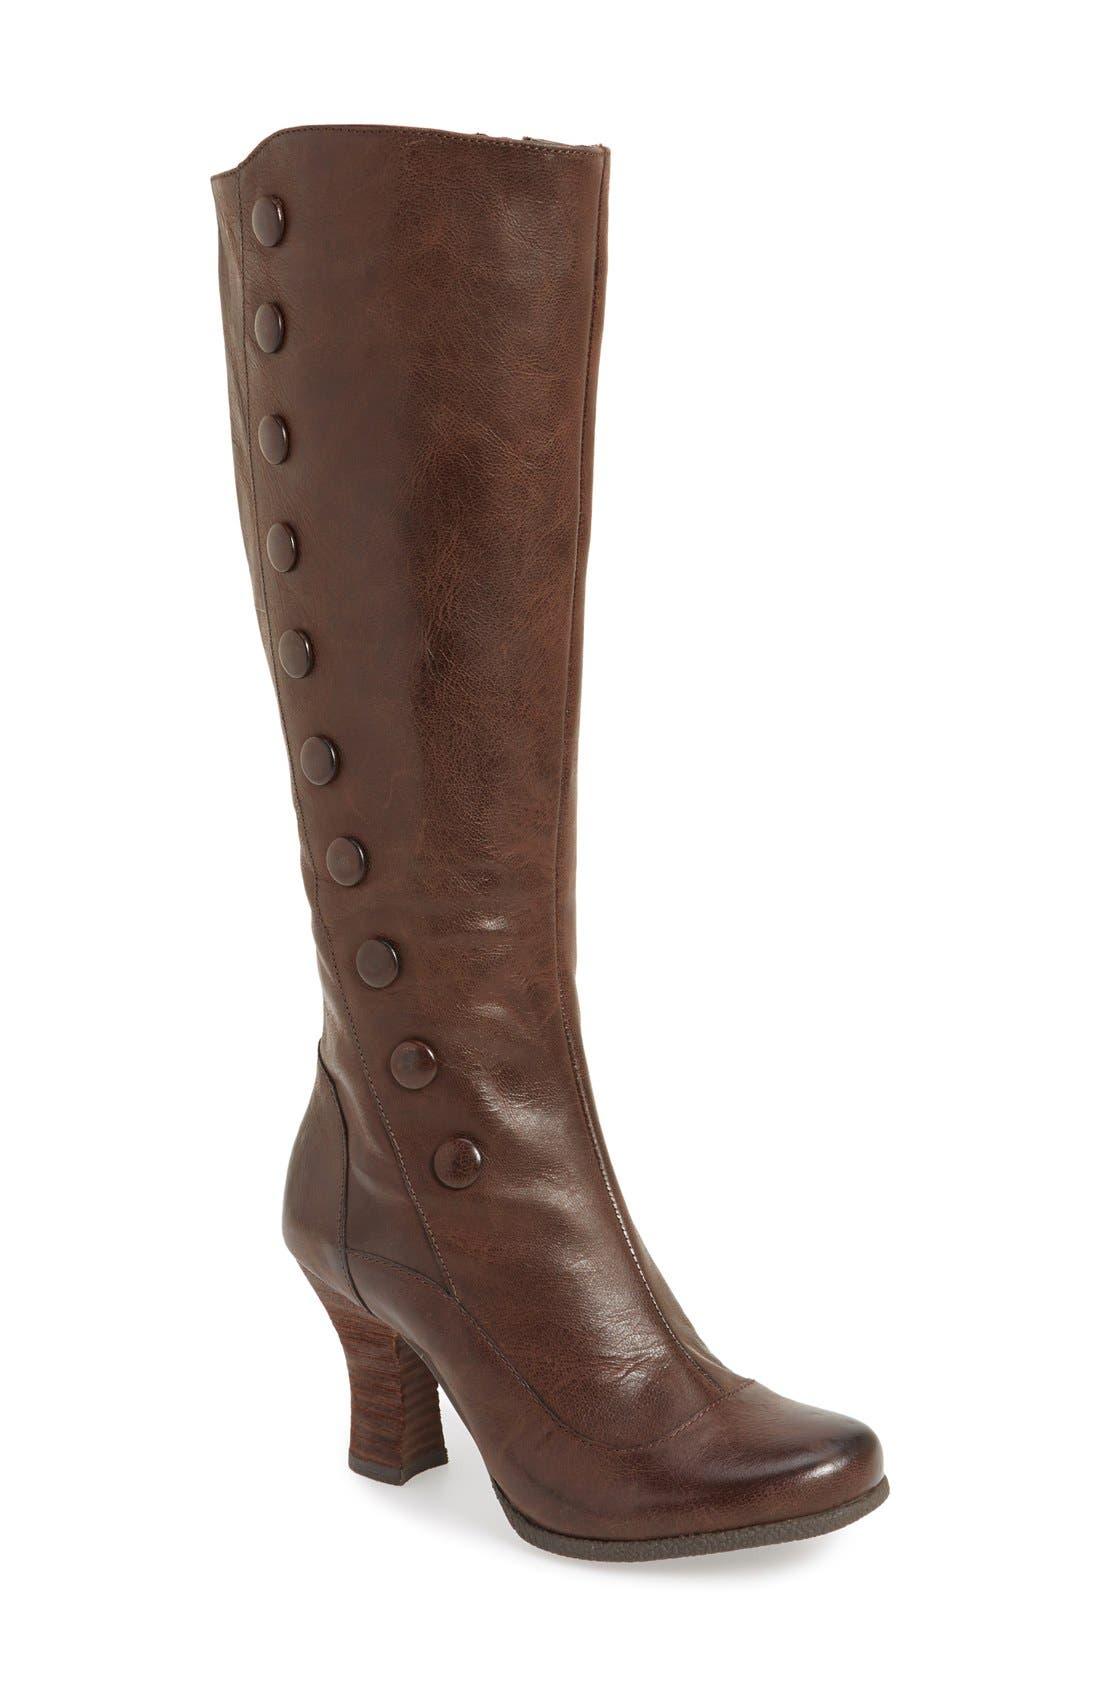 Alternate Image 1 Selected - MizMooz'Krista' Tall Boot (Women)